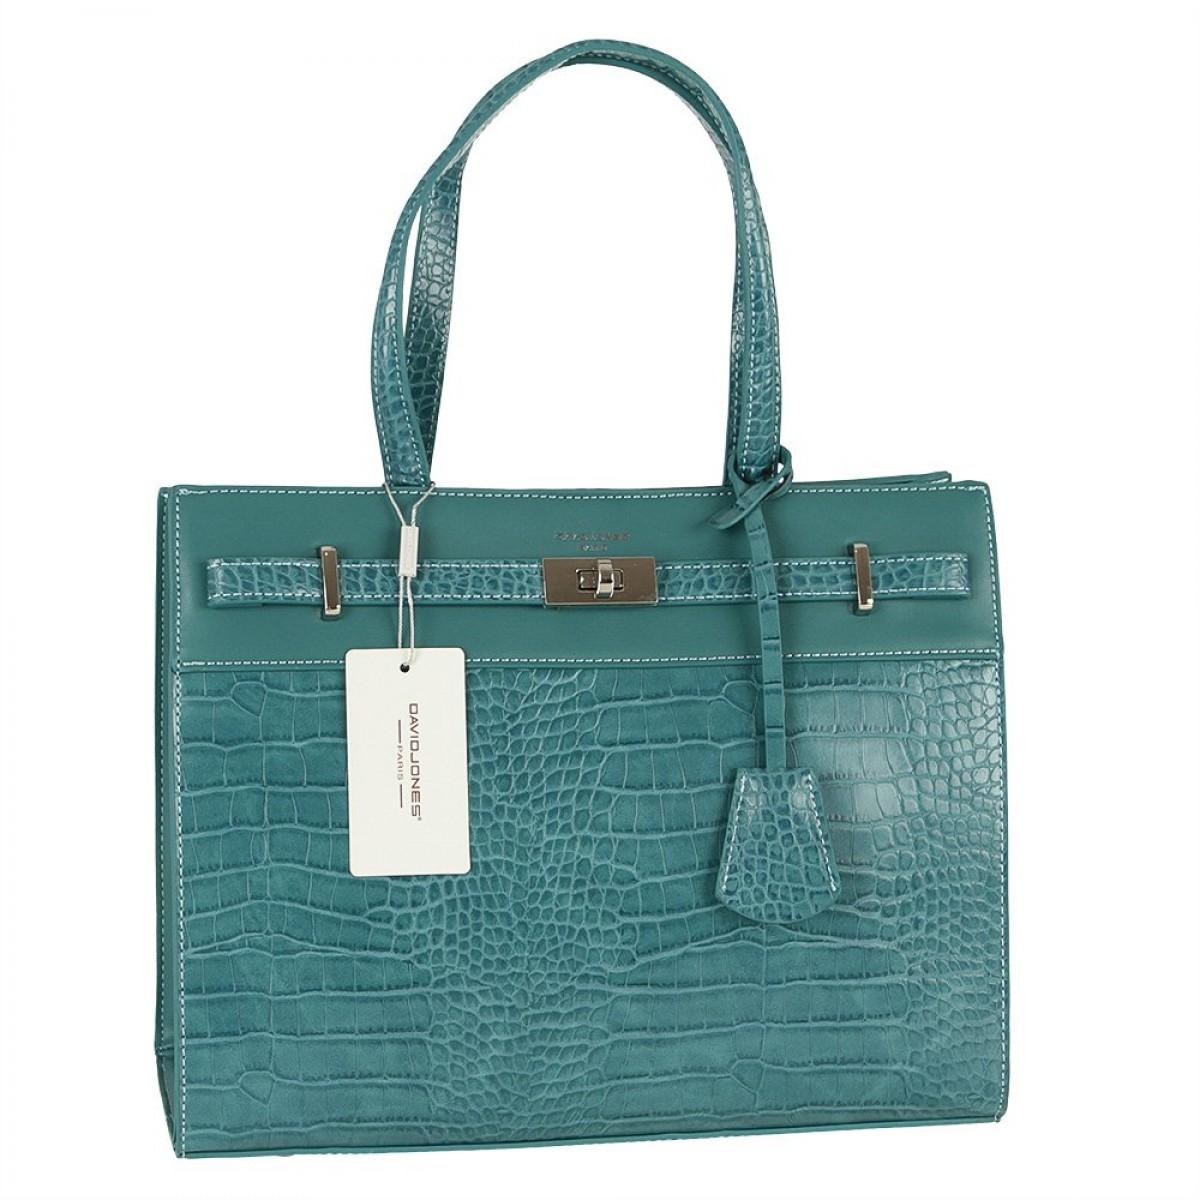 Жіноча сумка David Jones CM5634 PEACOCK BLUE